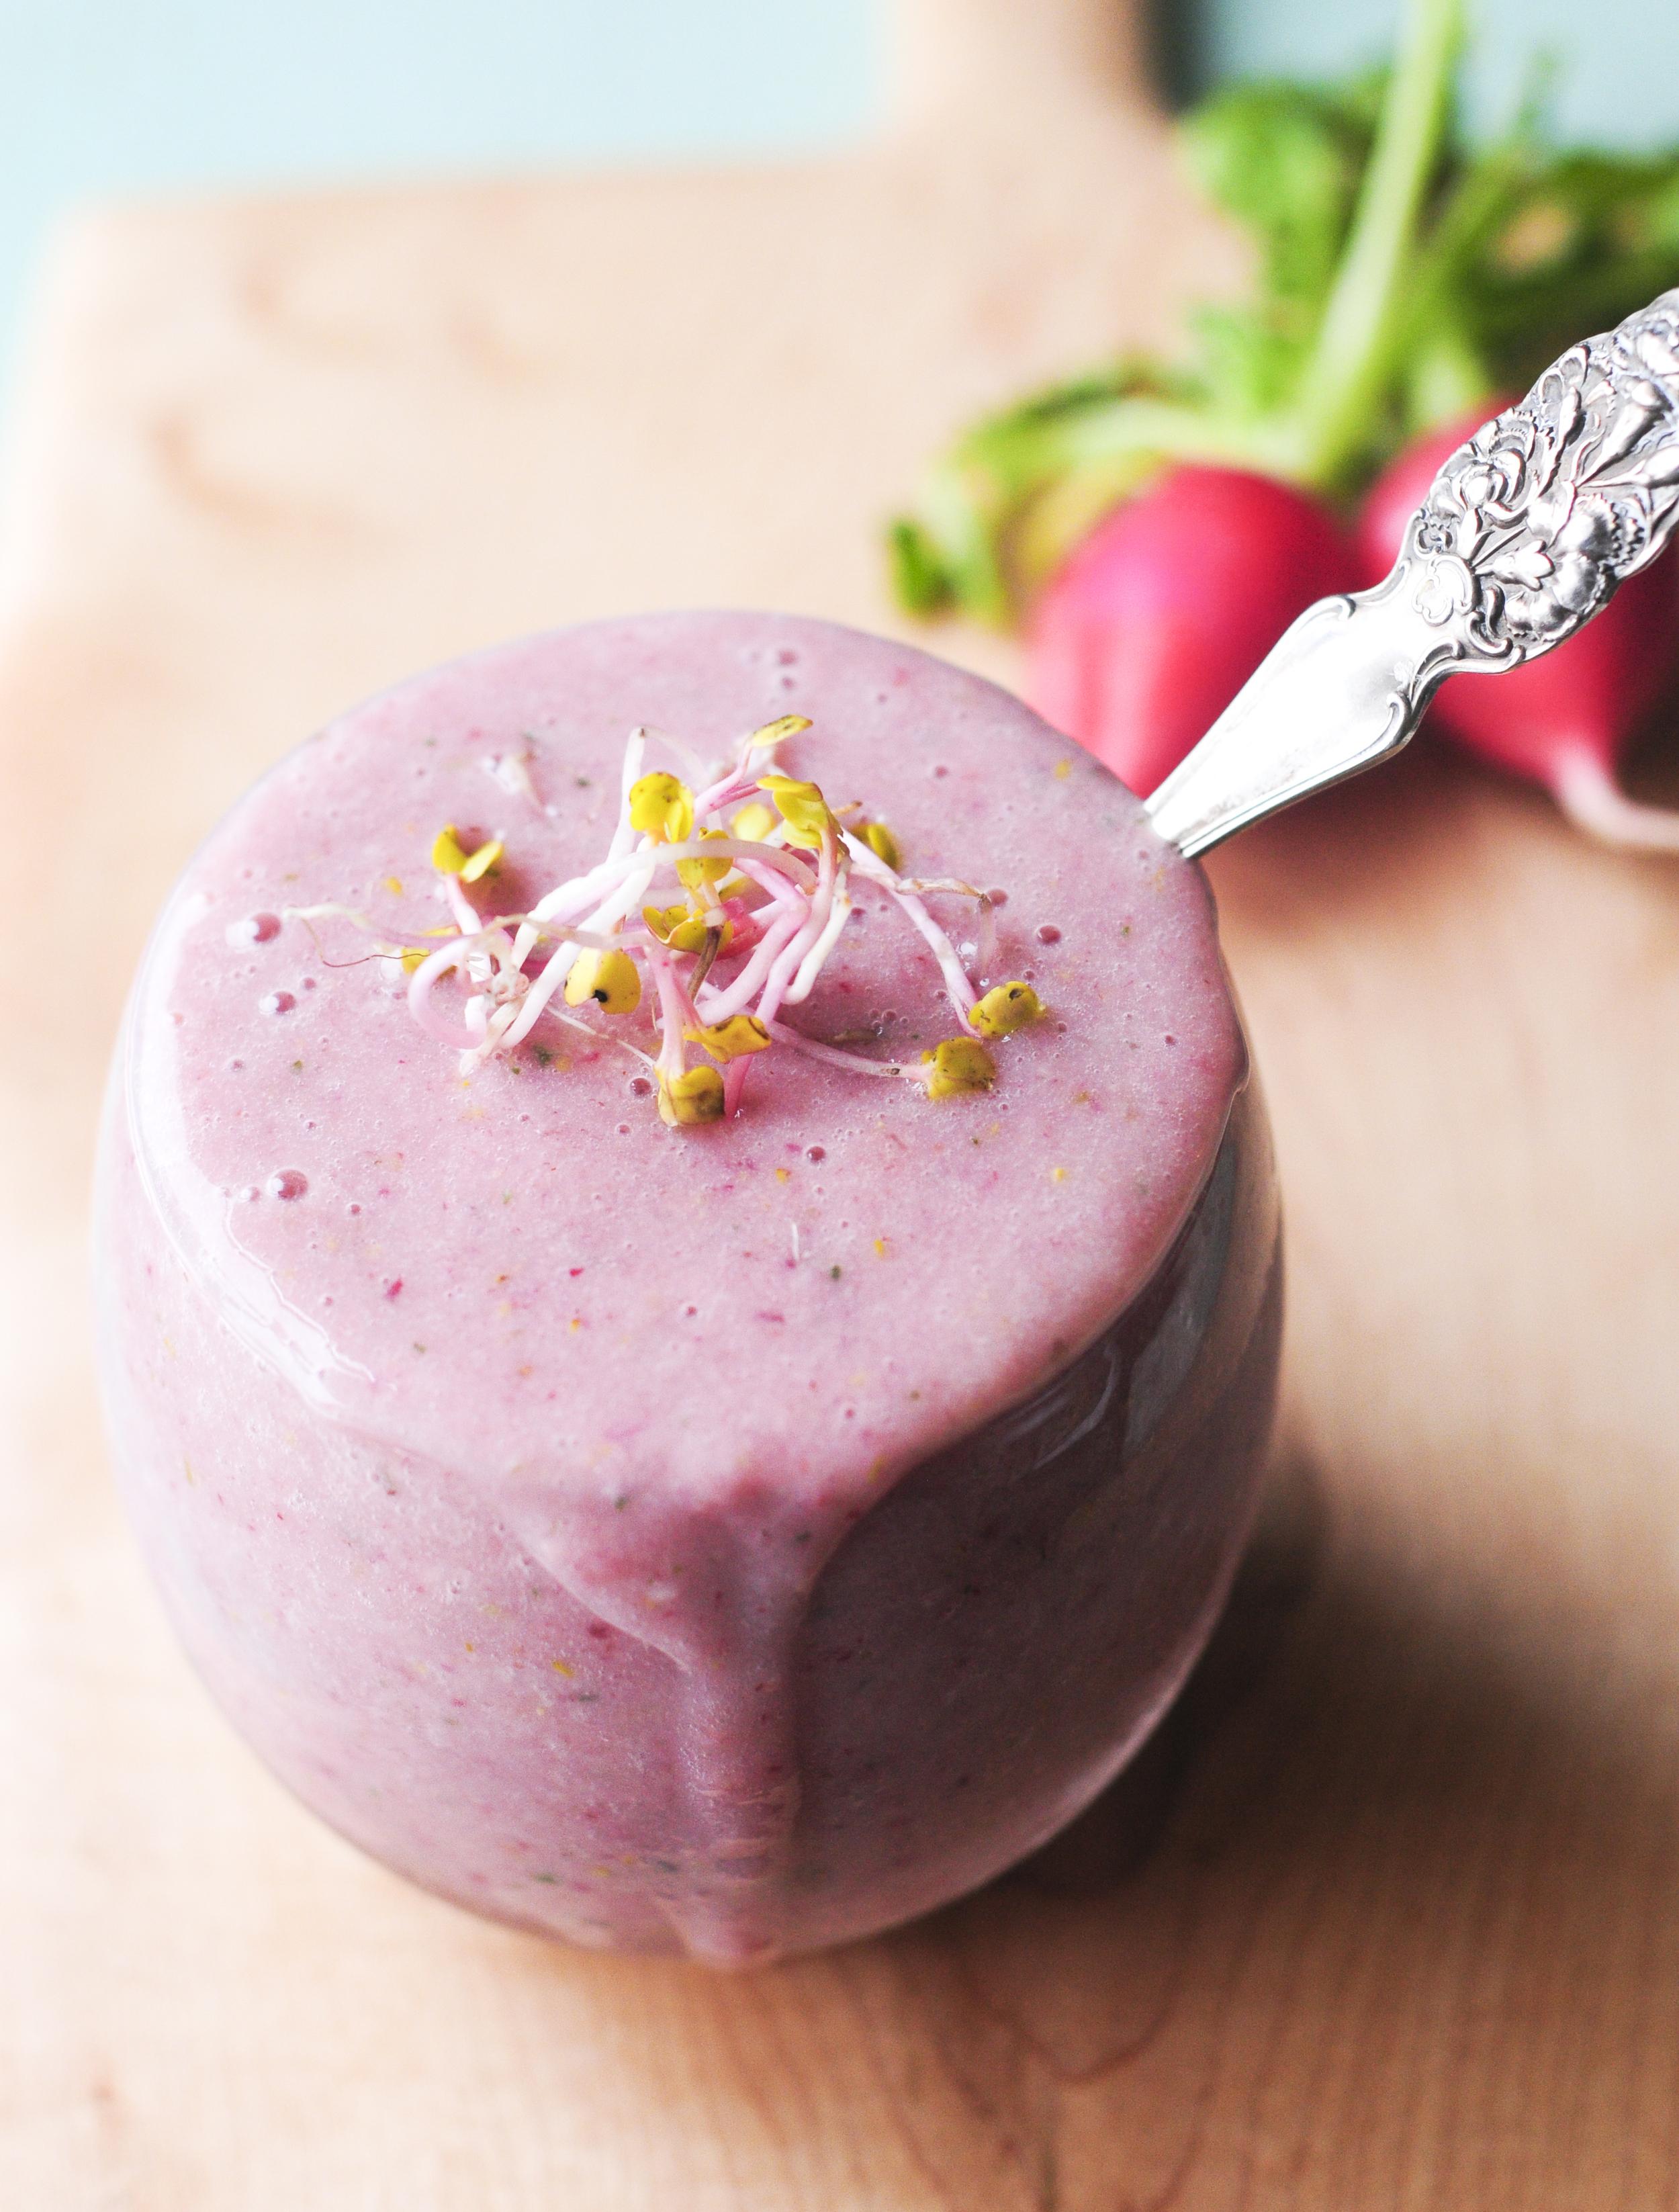 a.big.smoothie.radish.sprout.juice.DSC_4090.jpg